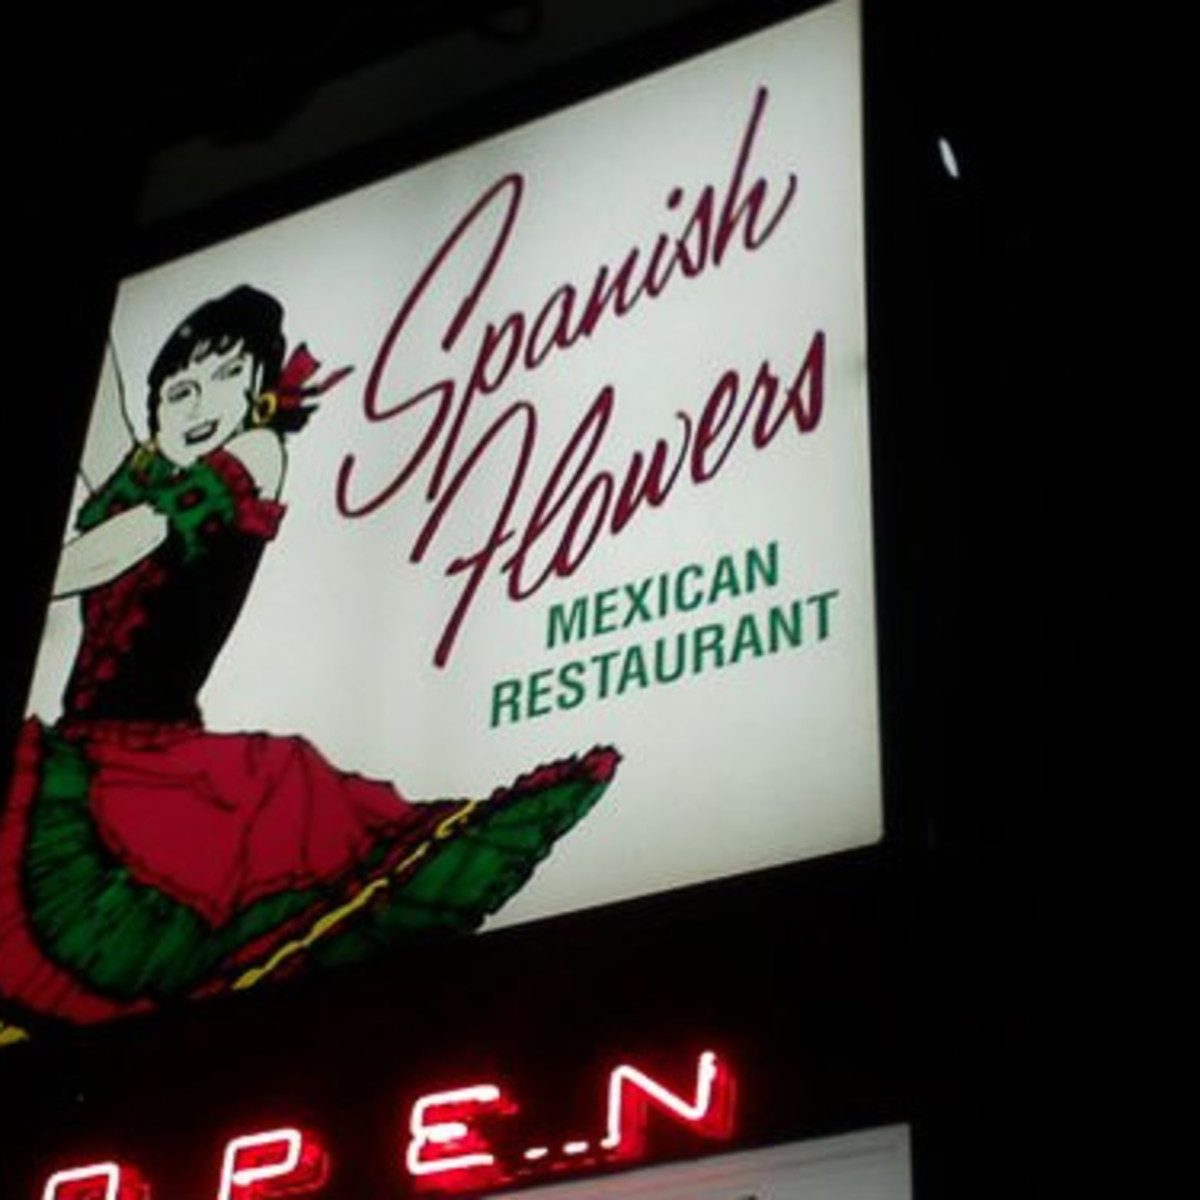 News_Spanish Flowers Mexican Restaurant